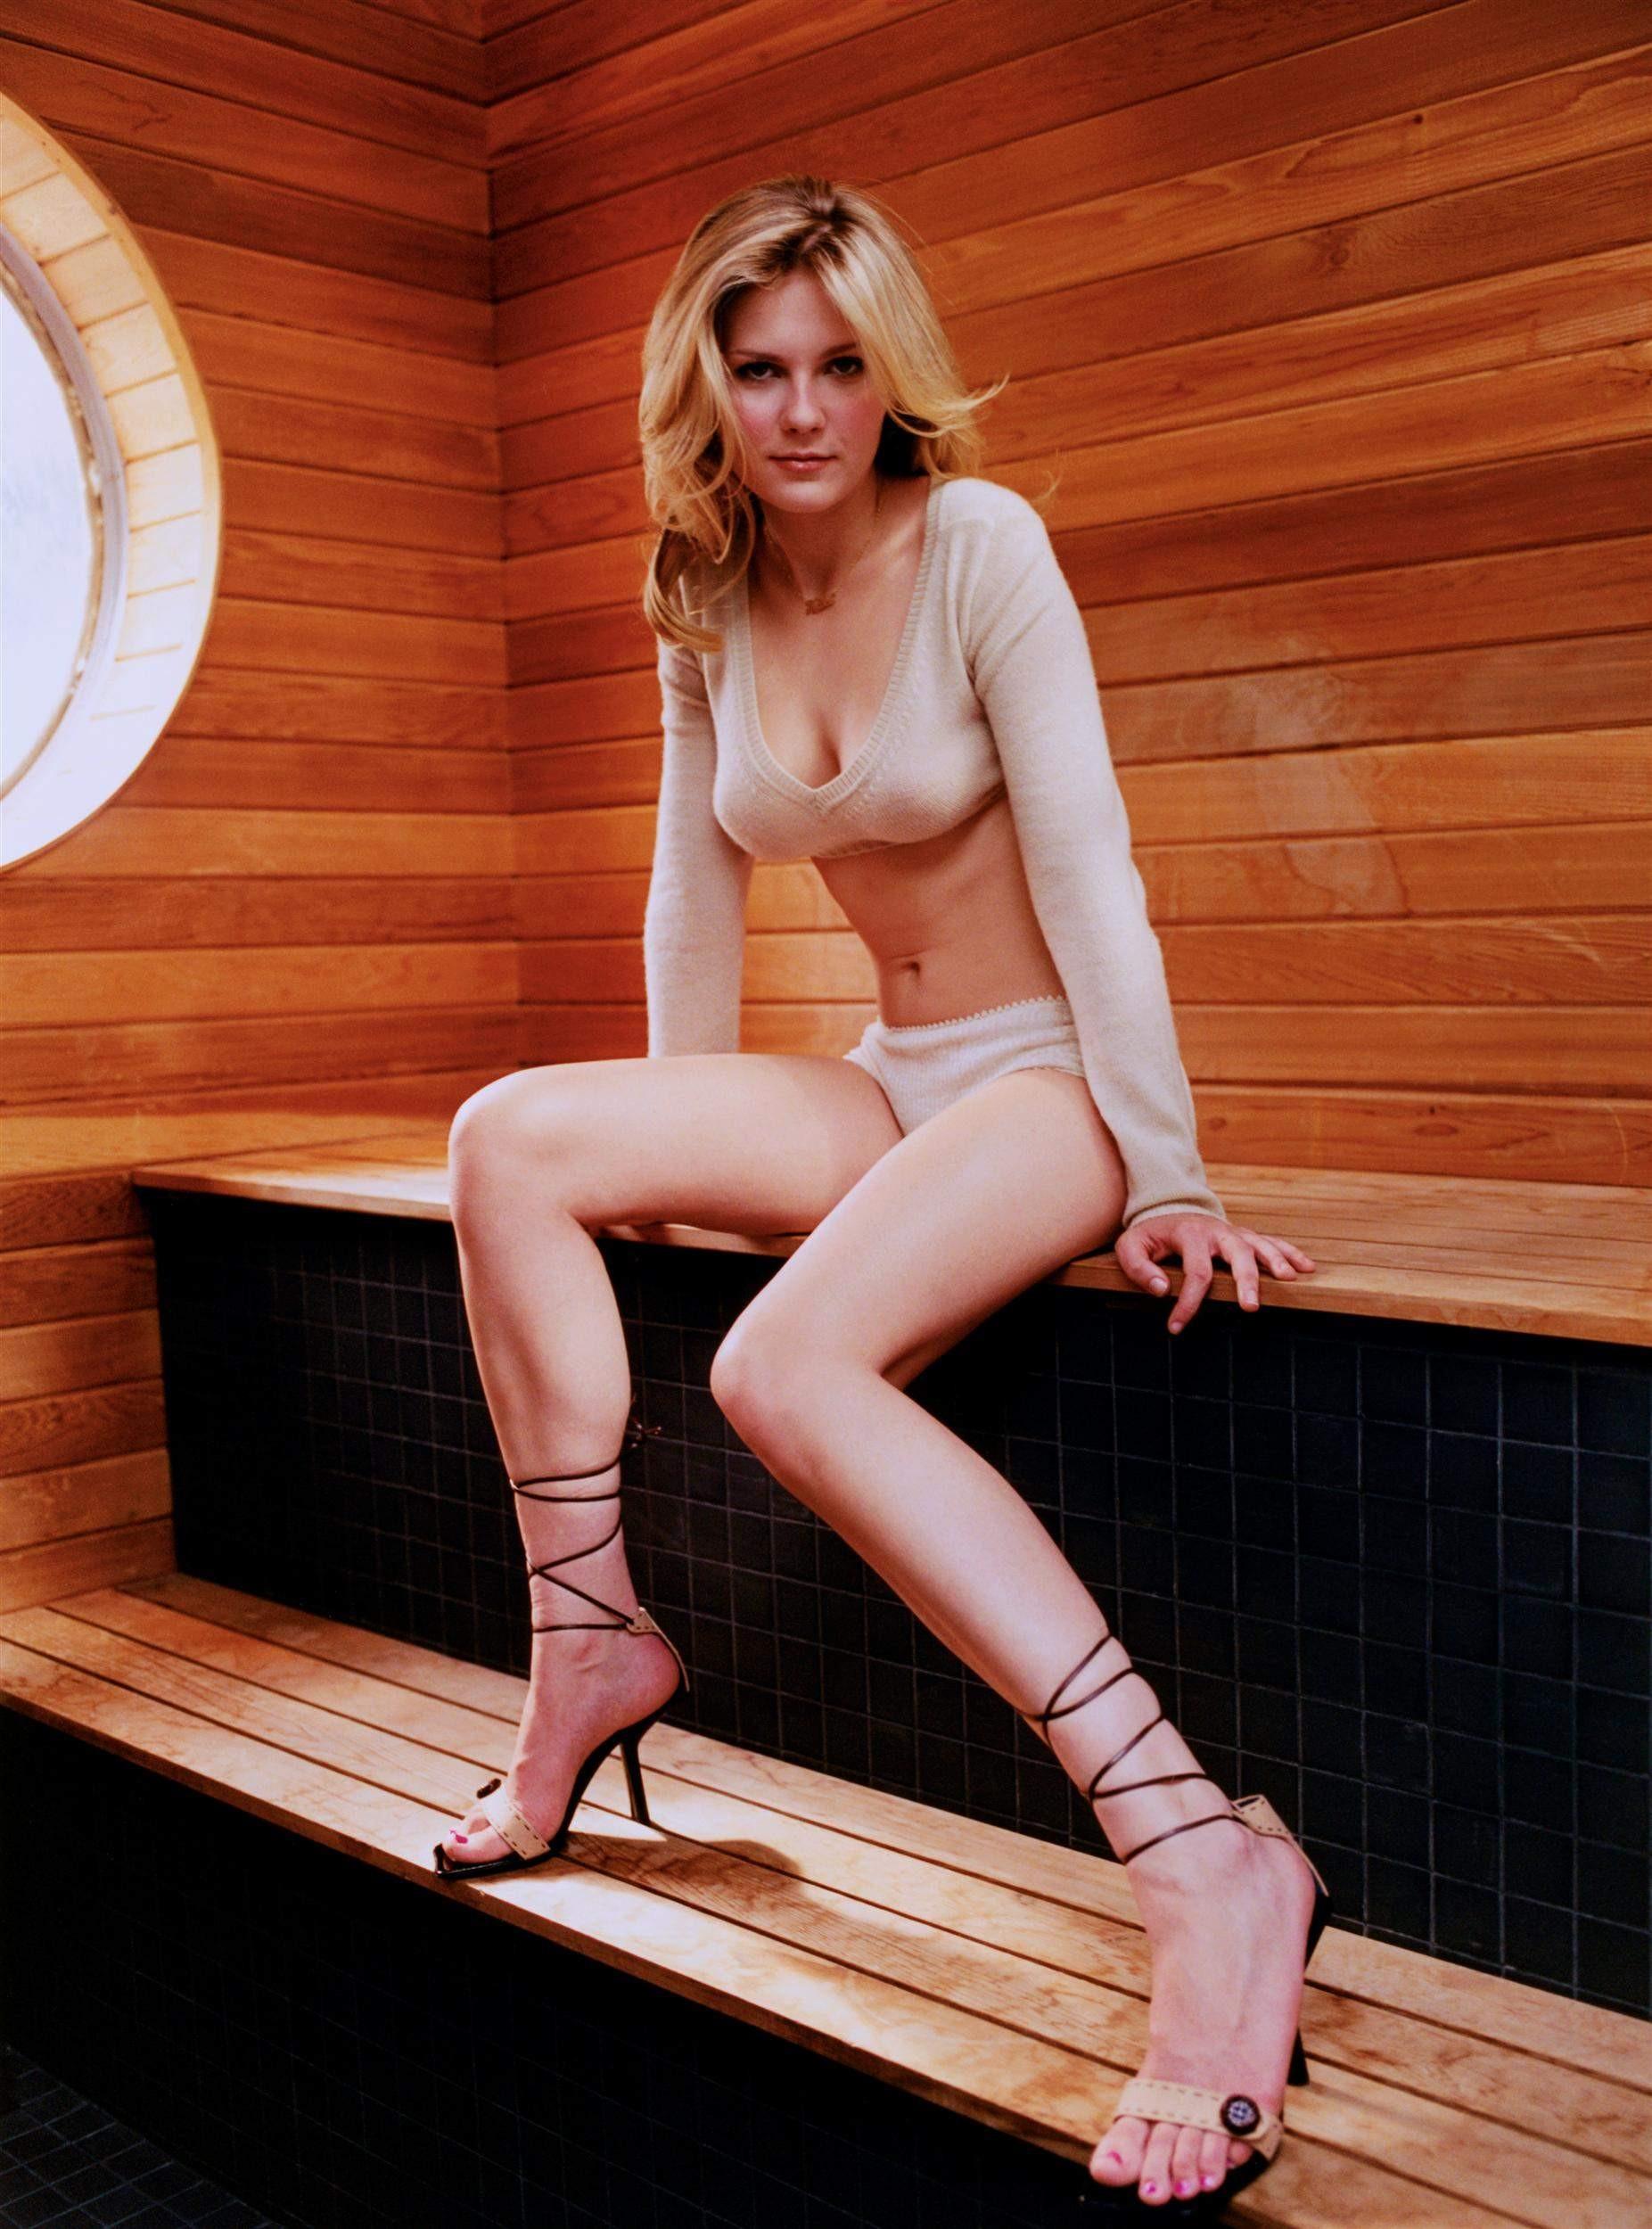 Kirsten Dunst At 18.